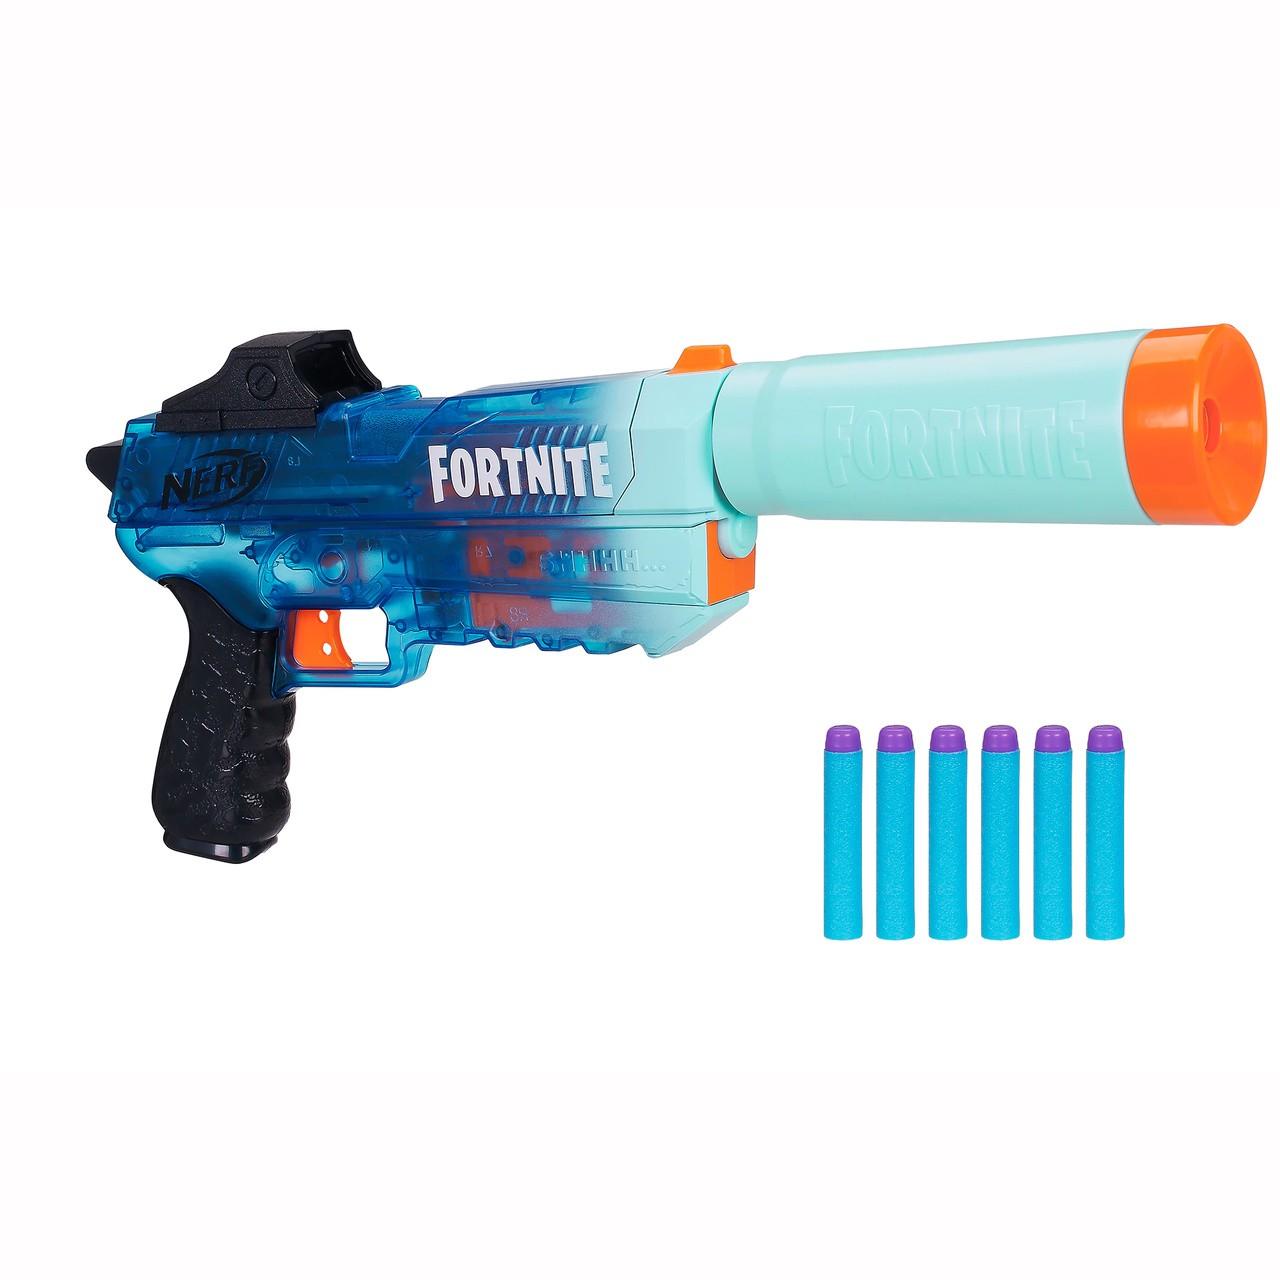 Lançador Nerf Fortnite SP-Rippley Extensor - Hasbro F1036